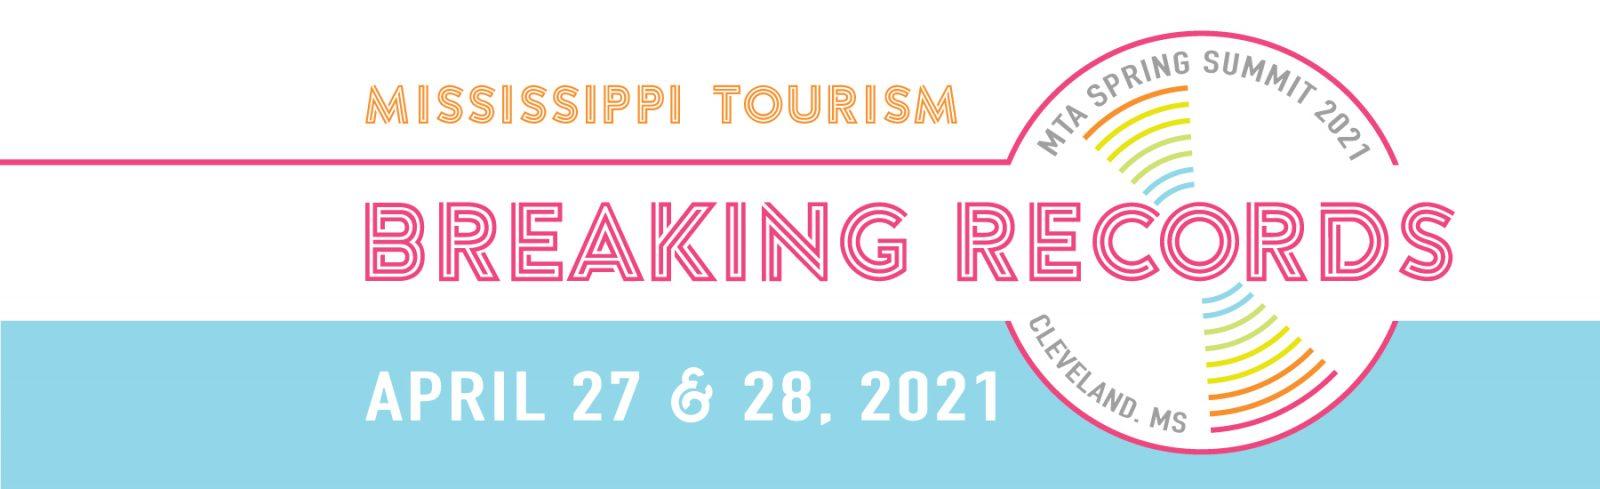 2021 Spring Summit